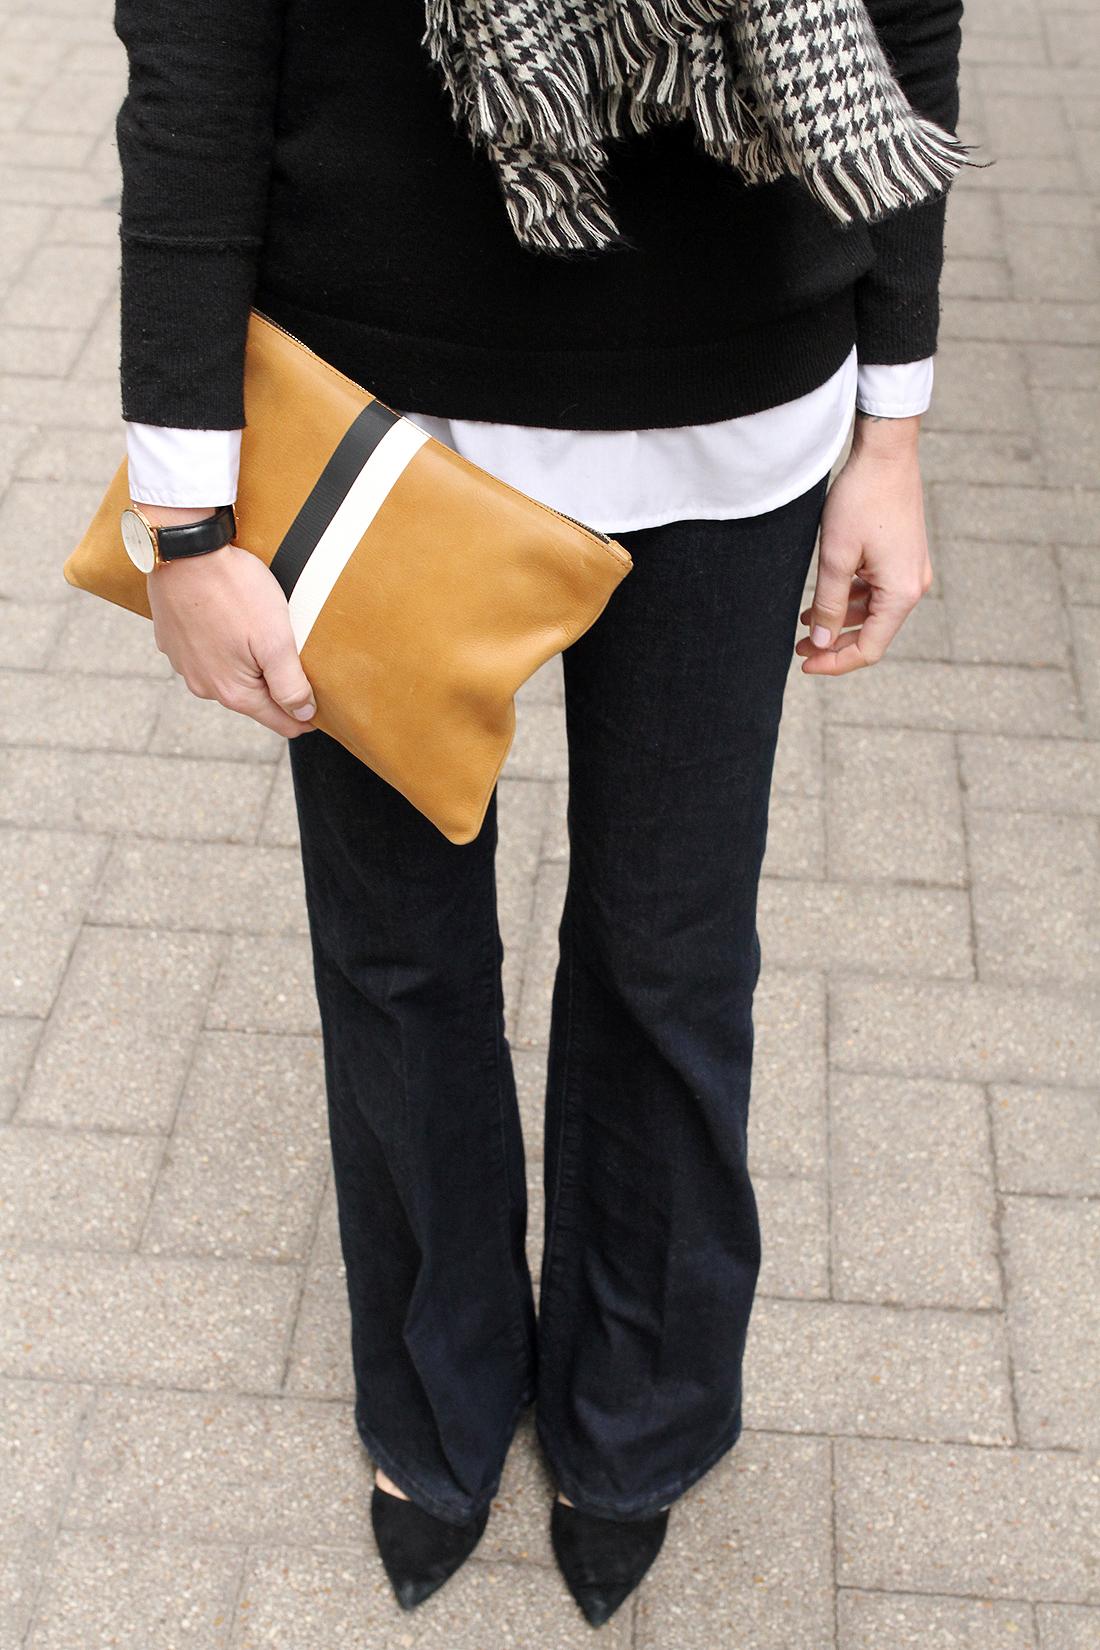 fashion-jackson-denim-flare-jeans-clare-v-clutch-houndstooth-scarf